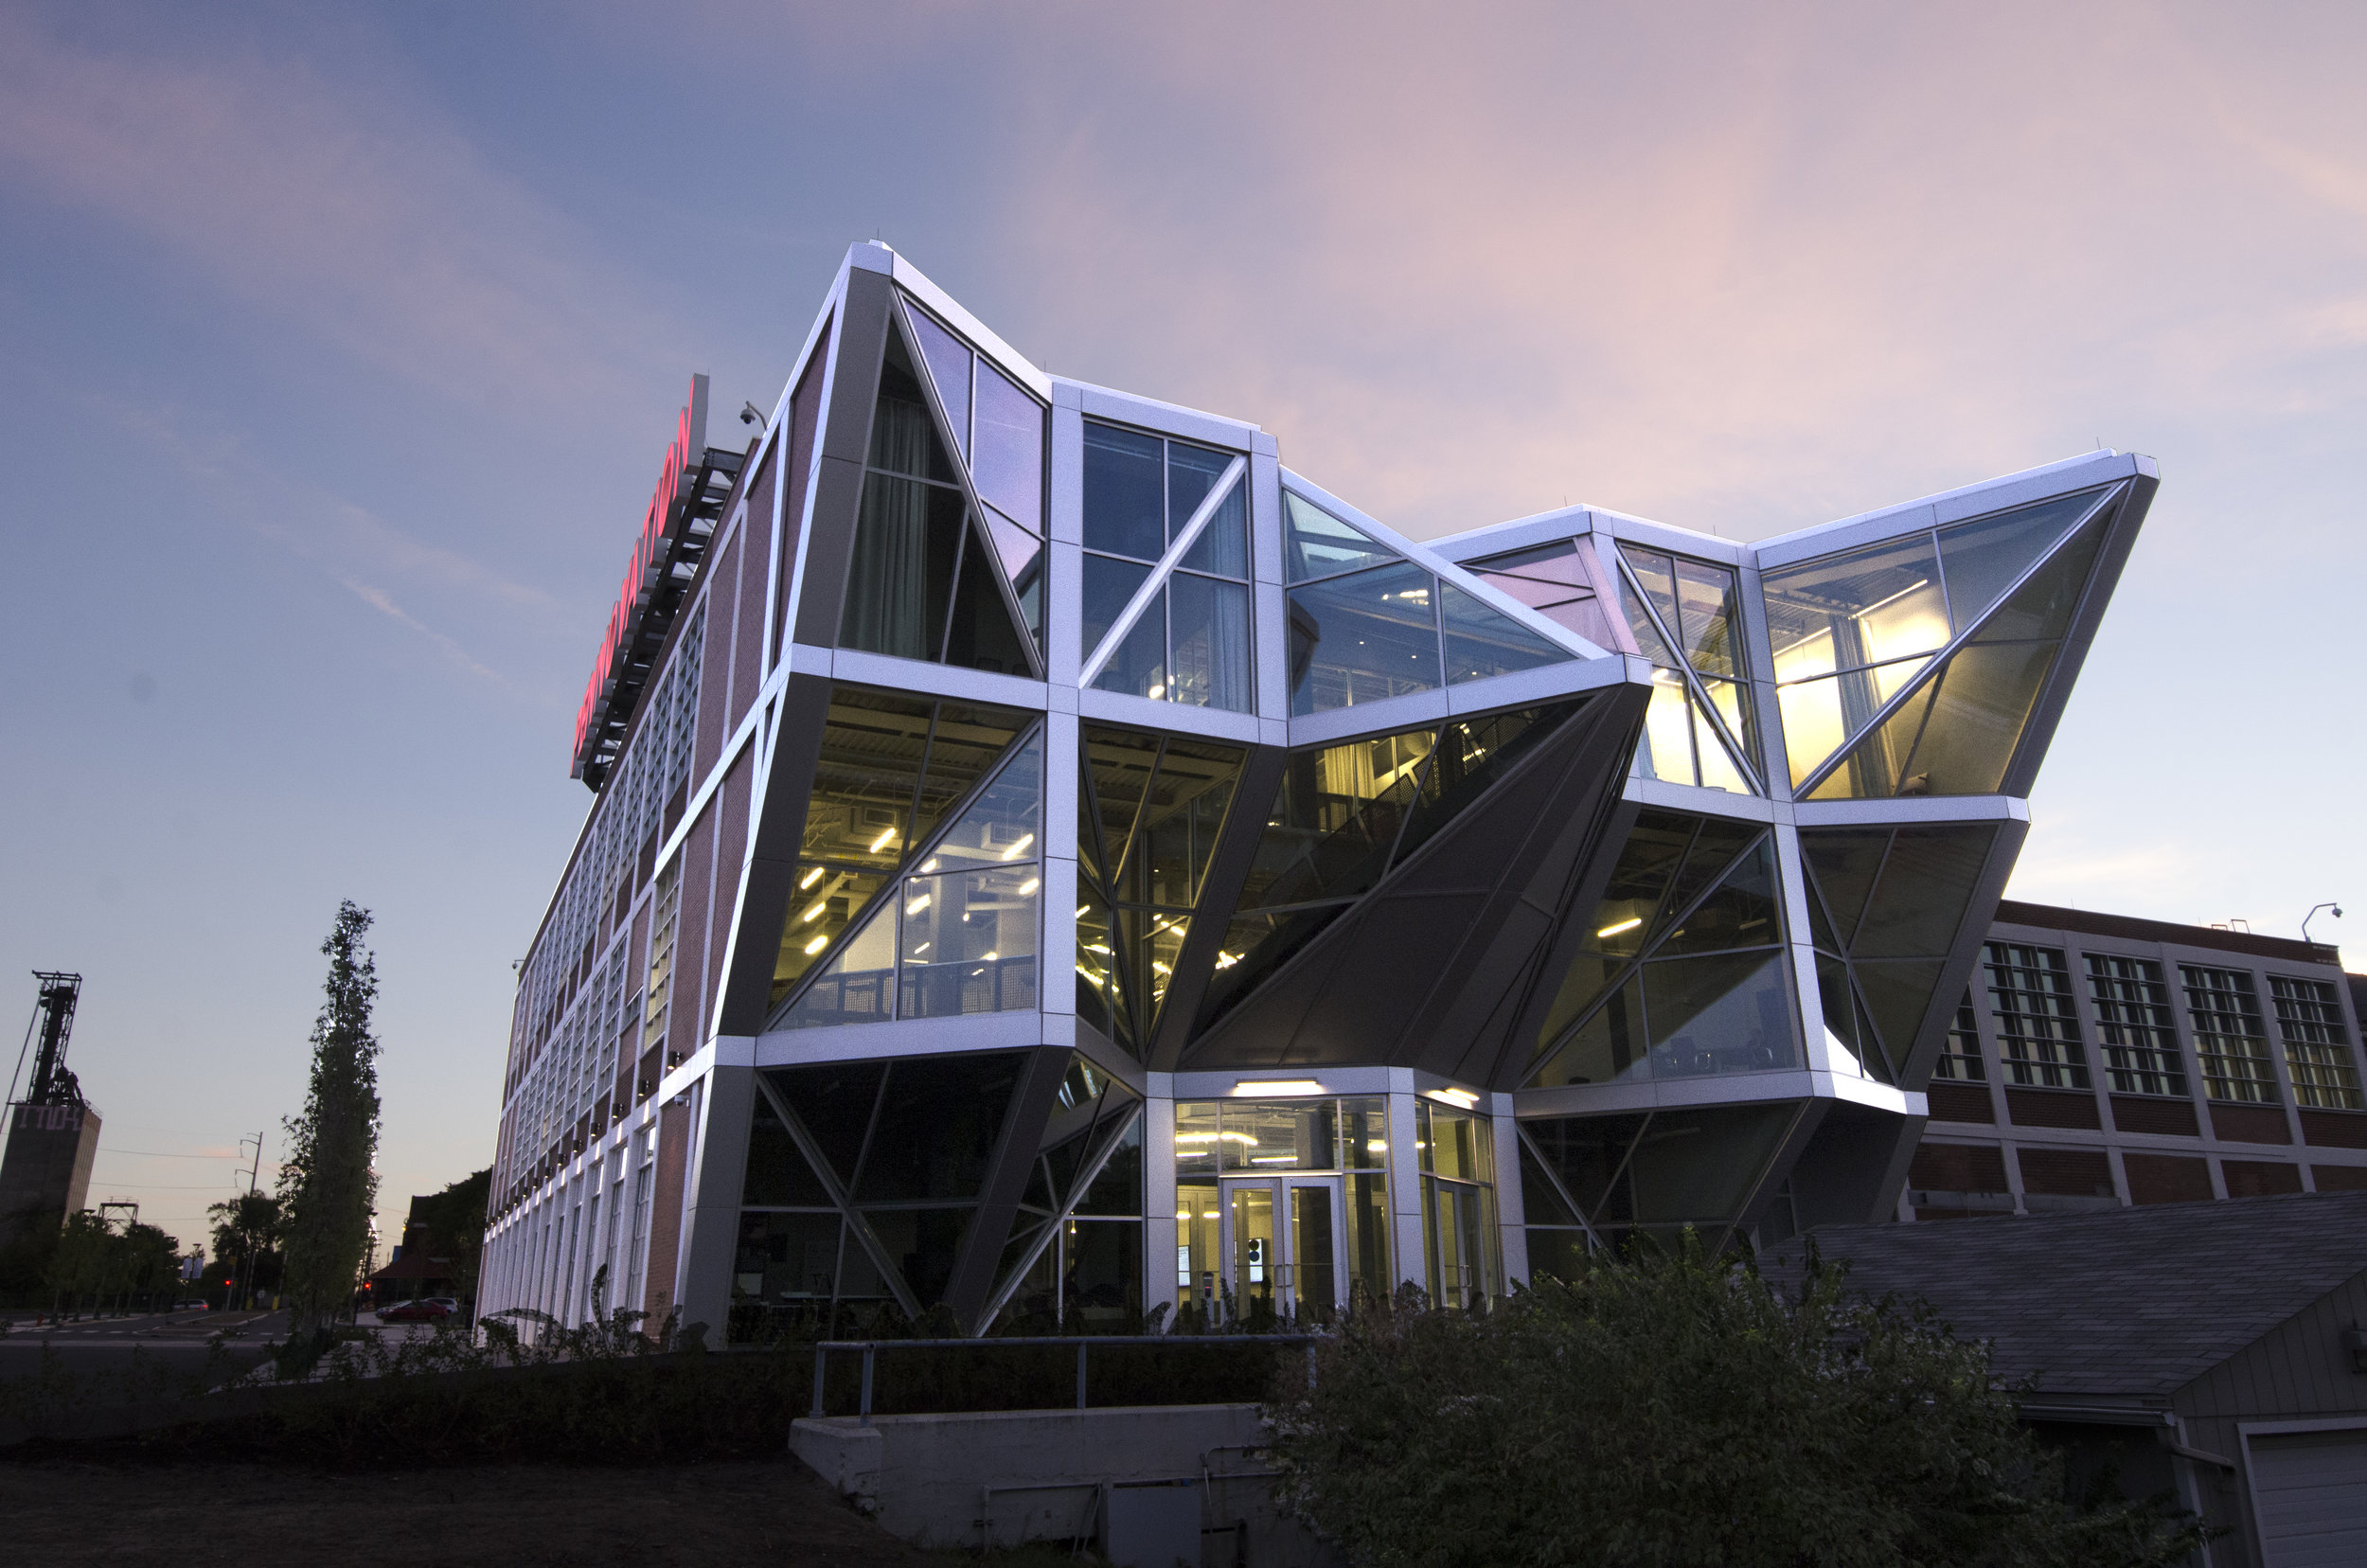 Pennovation Center